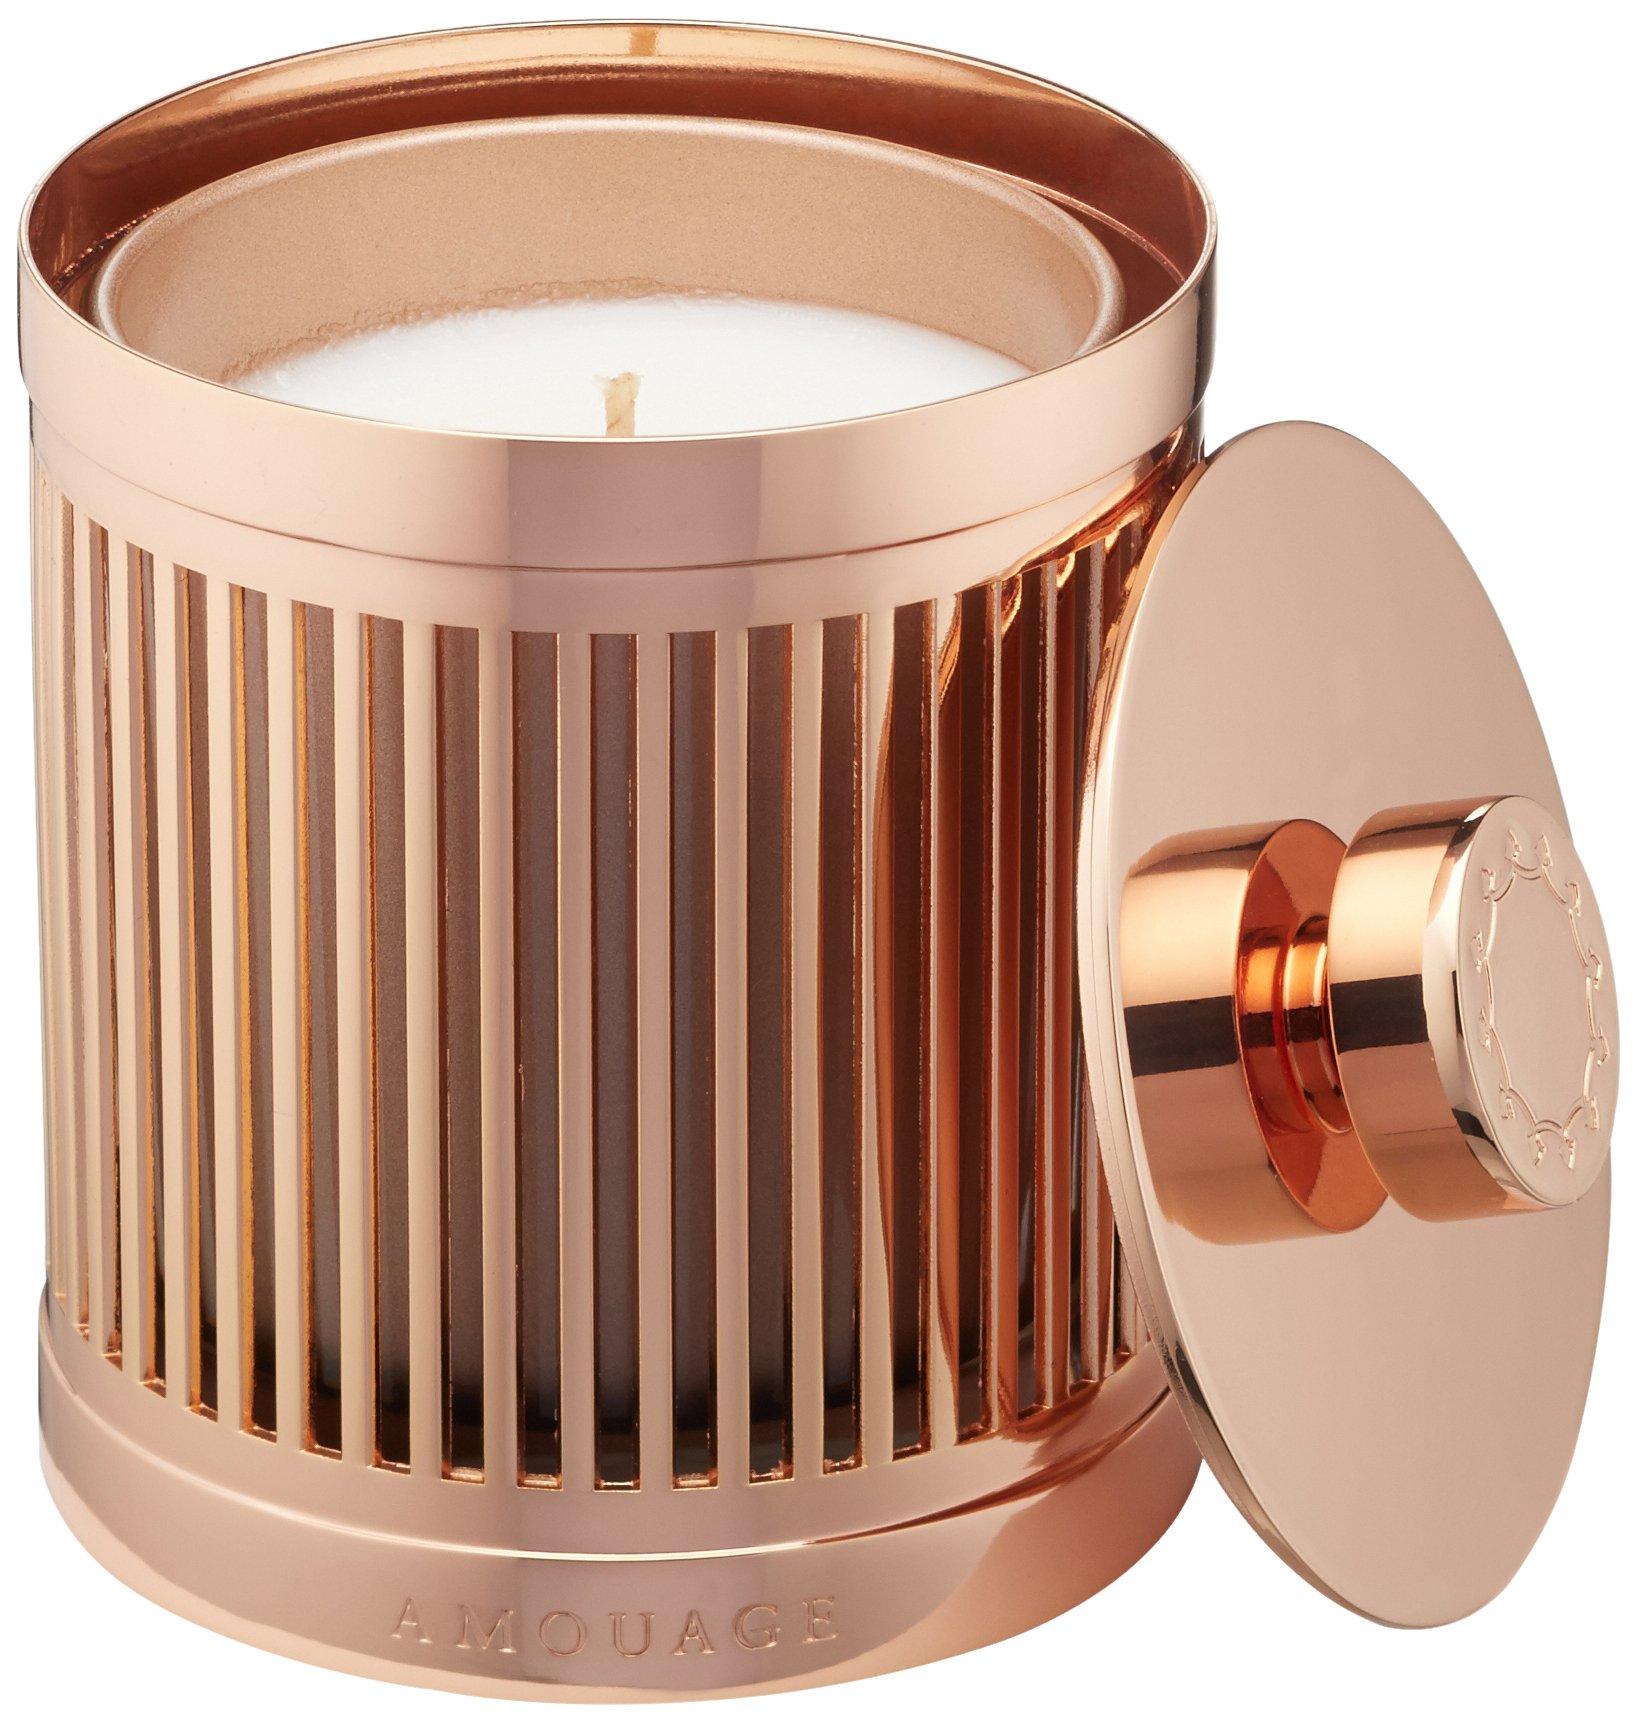 AMOUAGE Dia Women's Candle Fragrance Set, 6.9 oz.